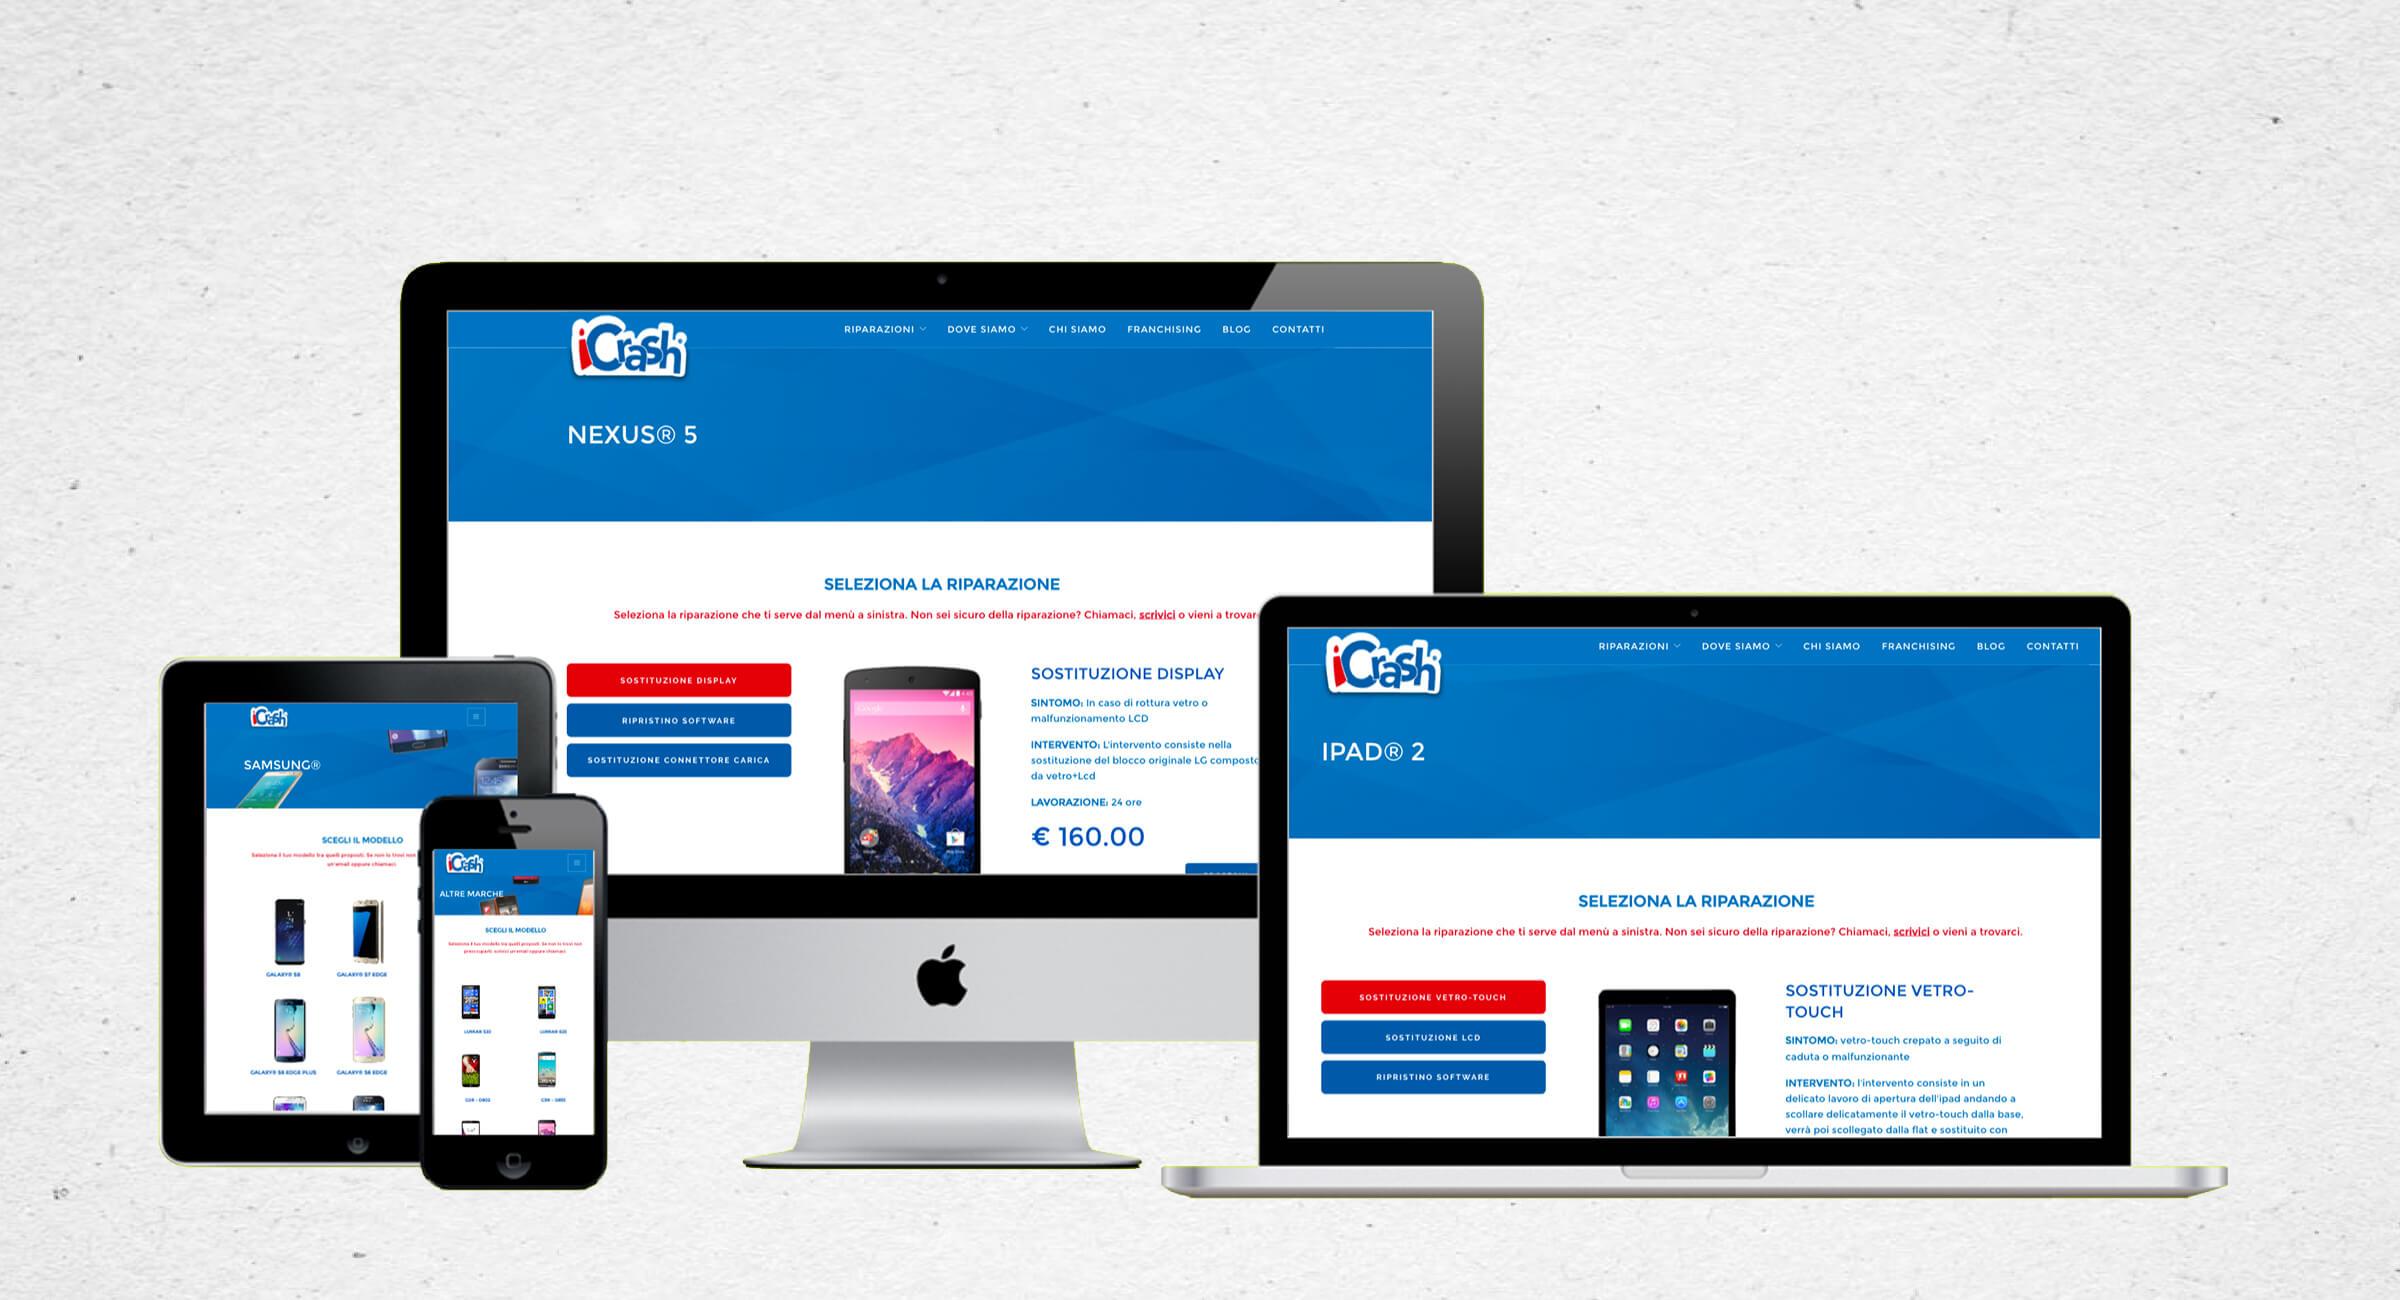 iCrash-sito-web-OnOff-Communication